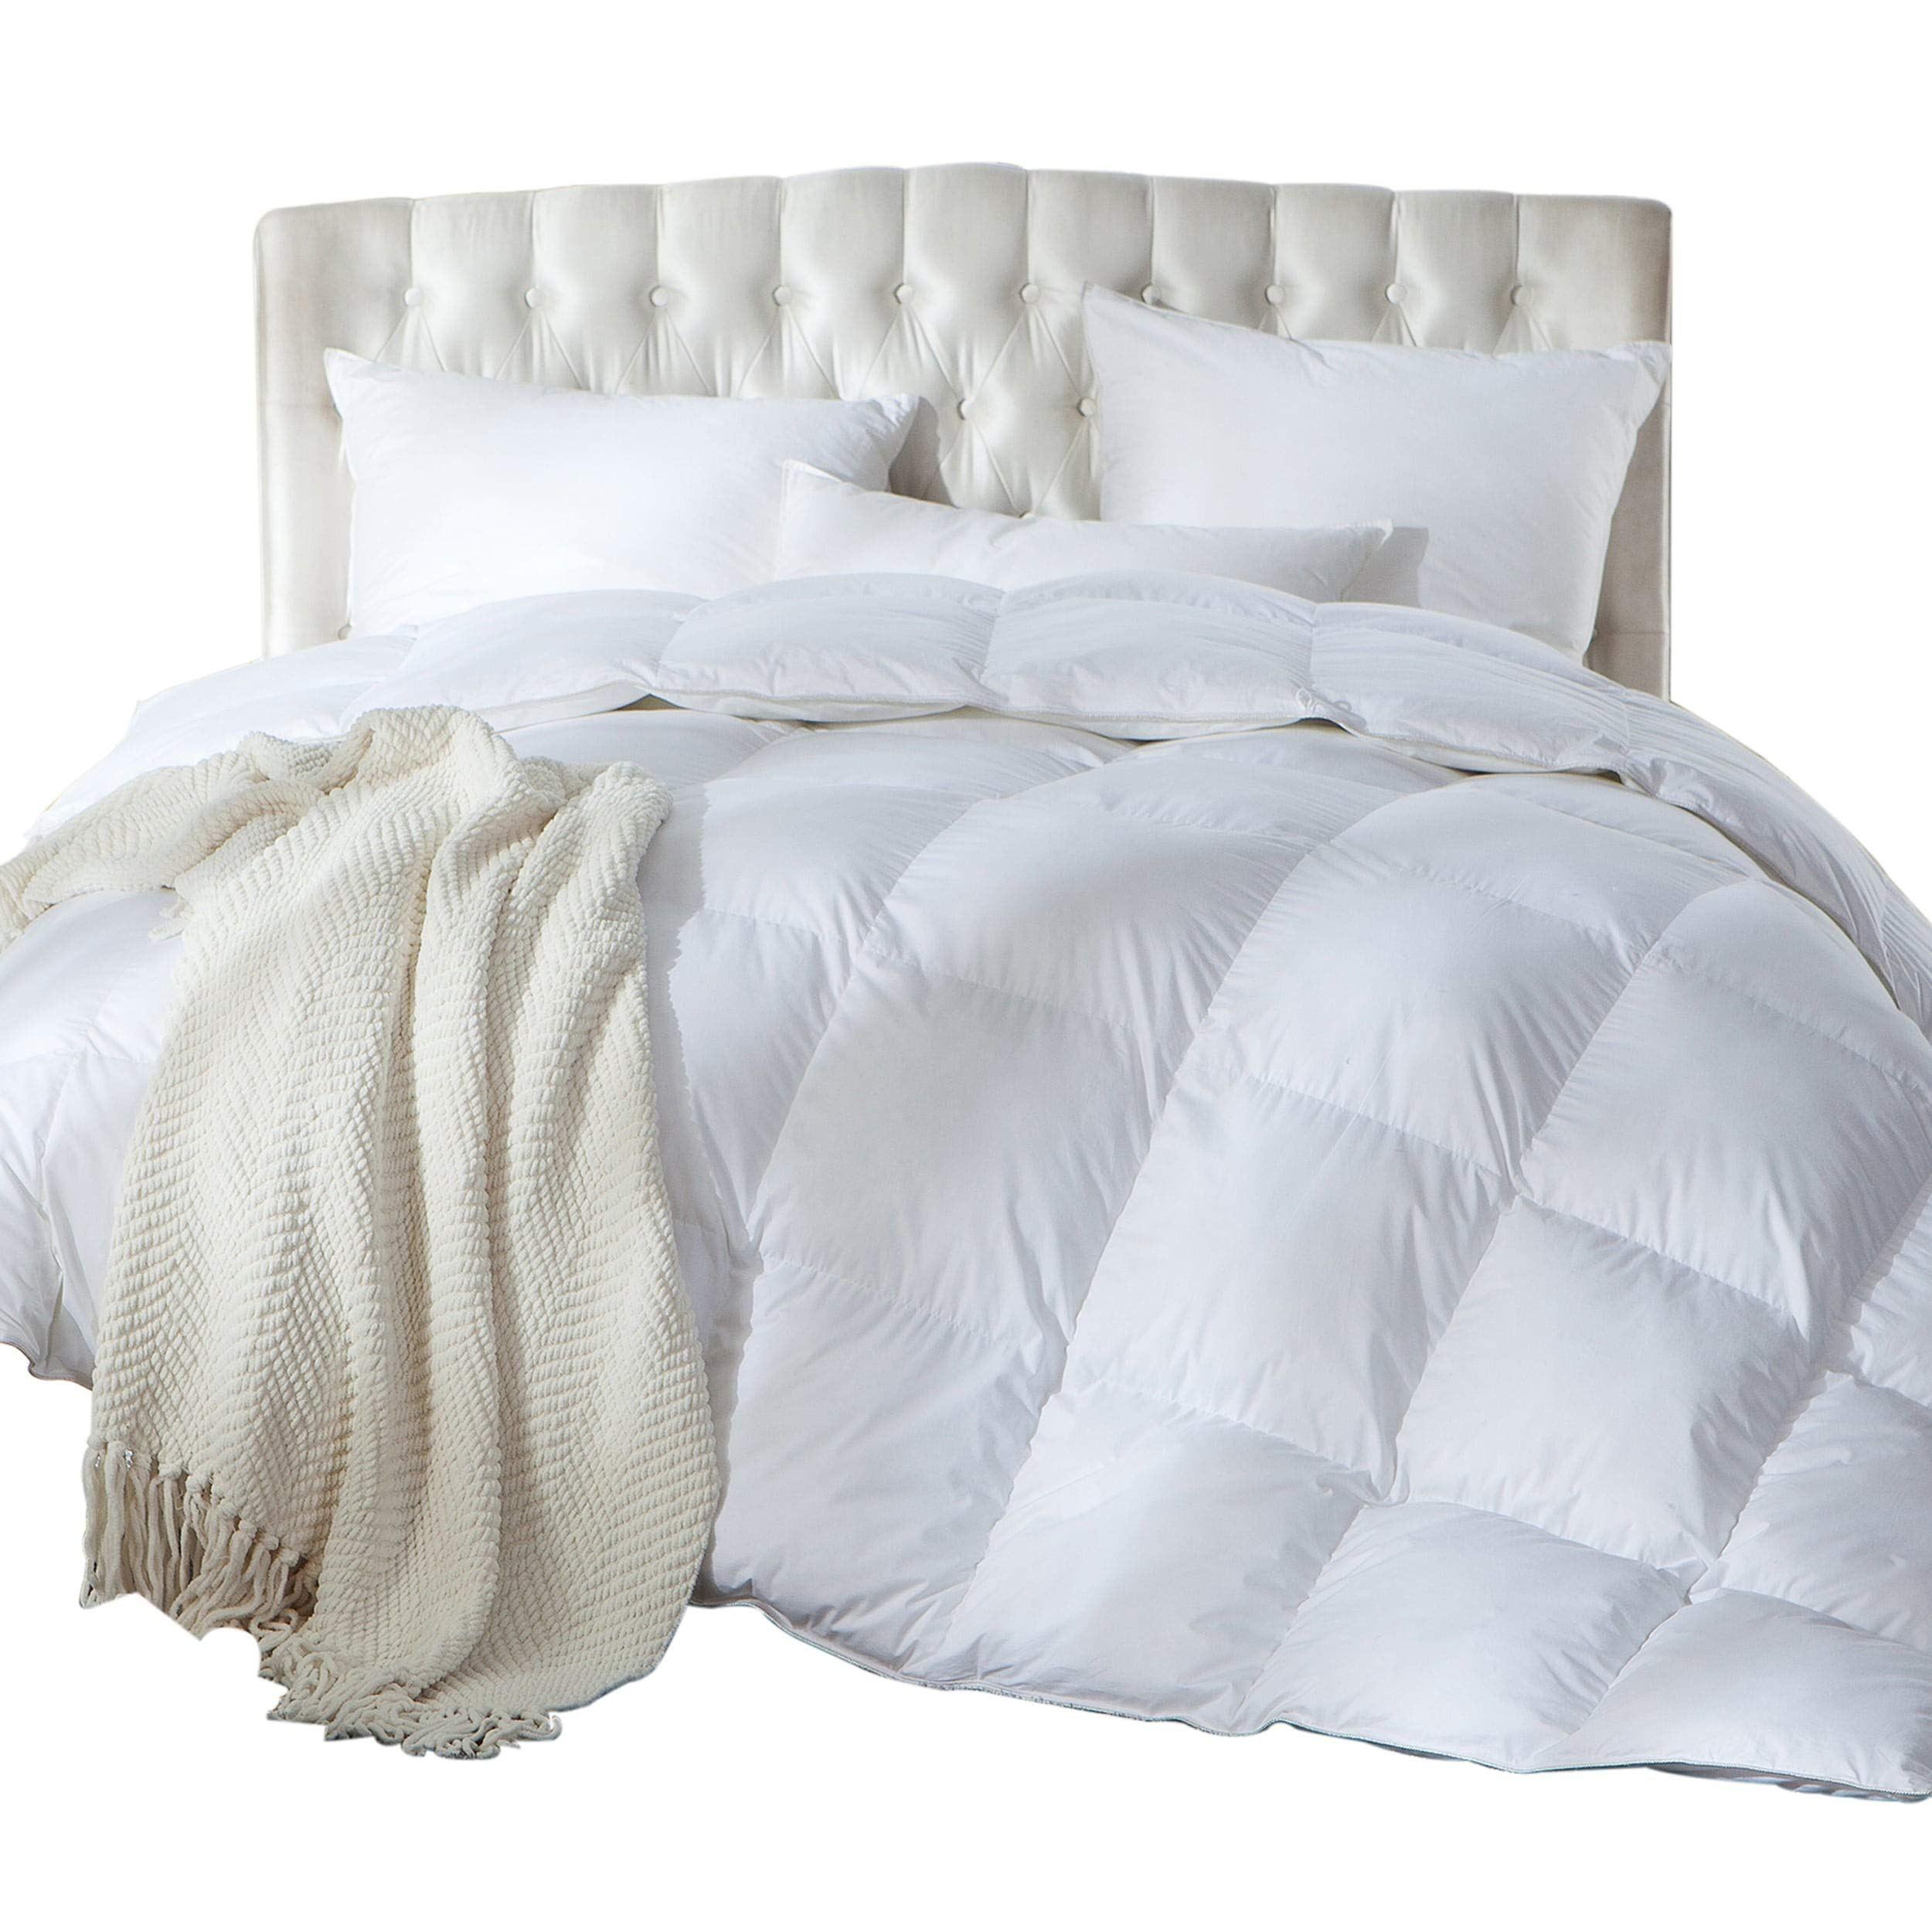 Luxurious Siberian Goose Down Comforter, 1200 Thread Count